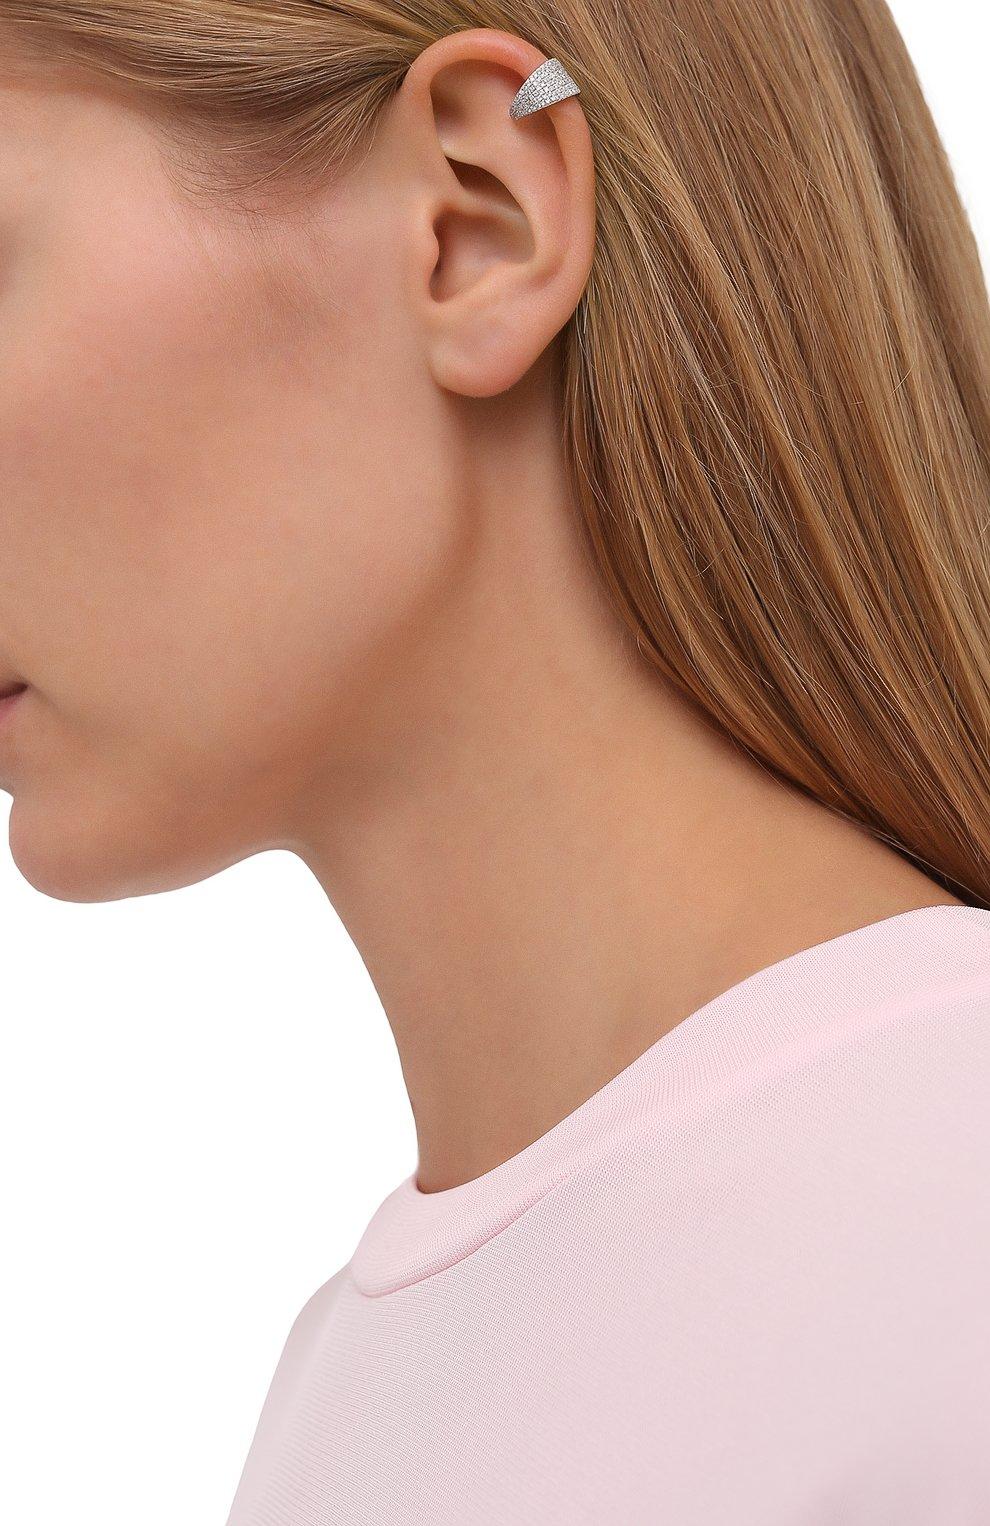 Женские моносерьга-кафф J-POINT серебряного цвета, арт. КФ857.16.250221.4W | Фото 2 (Кросс-КТ: моносерьга; Материал: Металл)